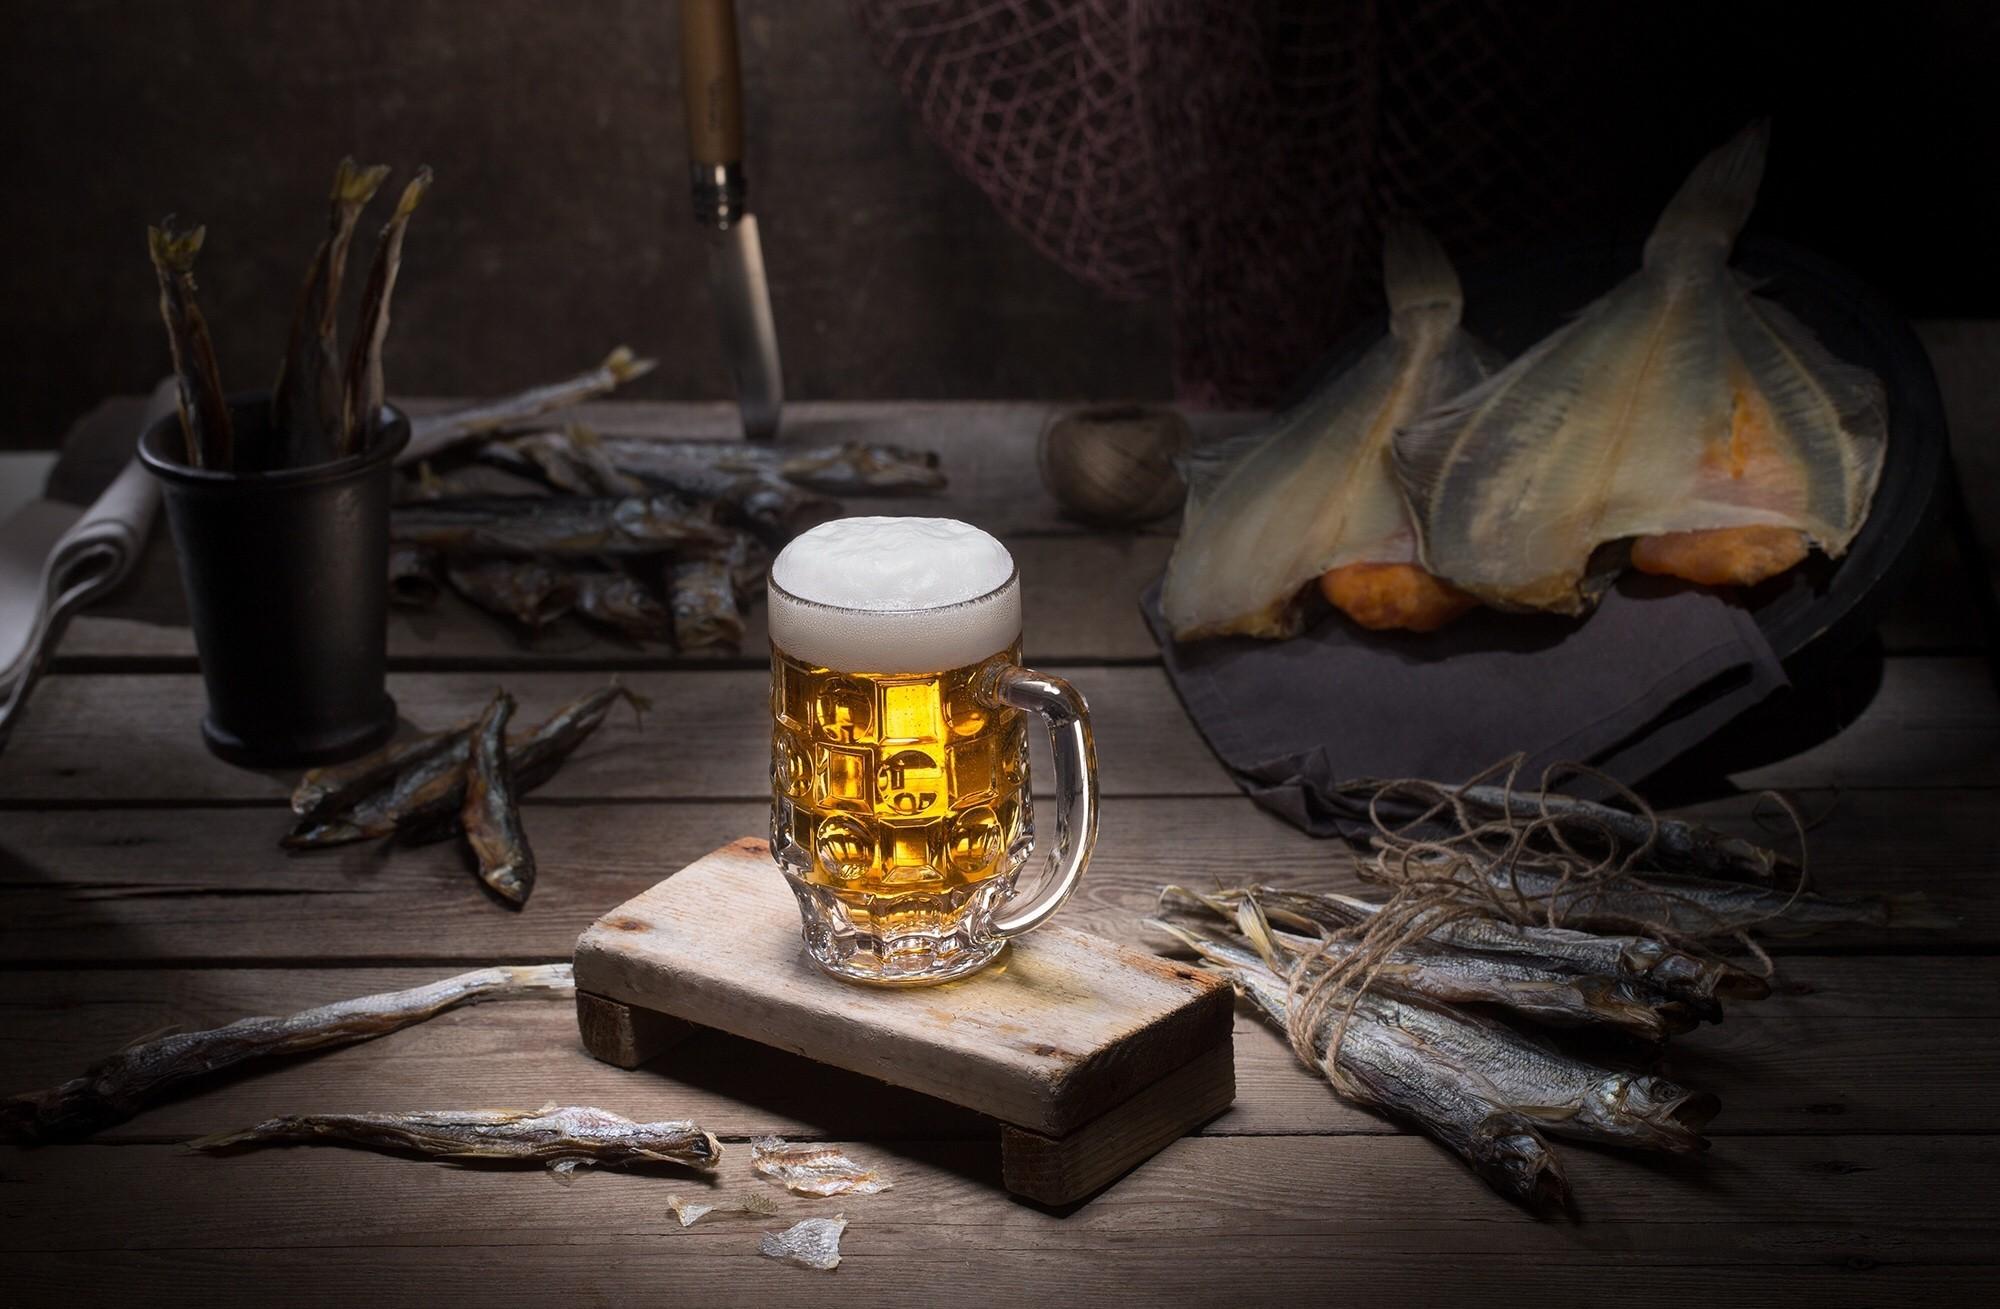 Wallpaper : gelas minum, bir, makanan, ikan, masih hidup